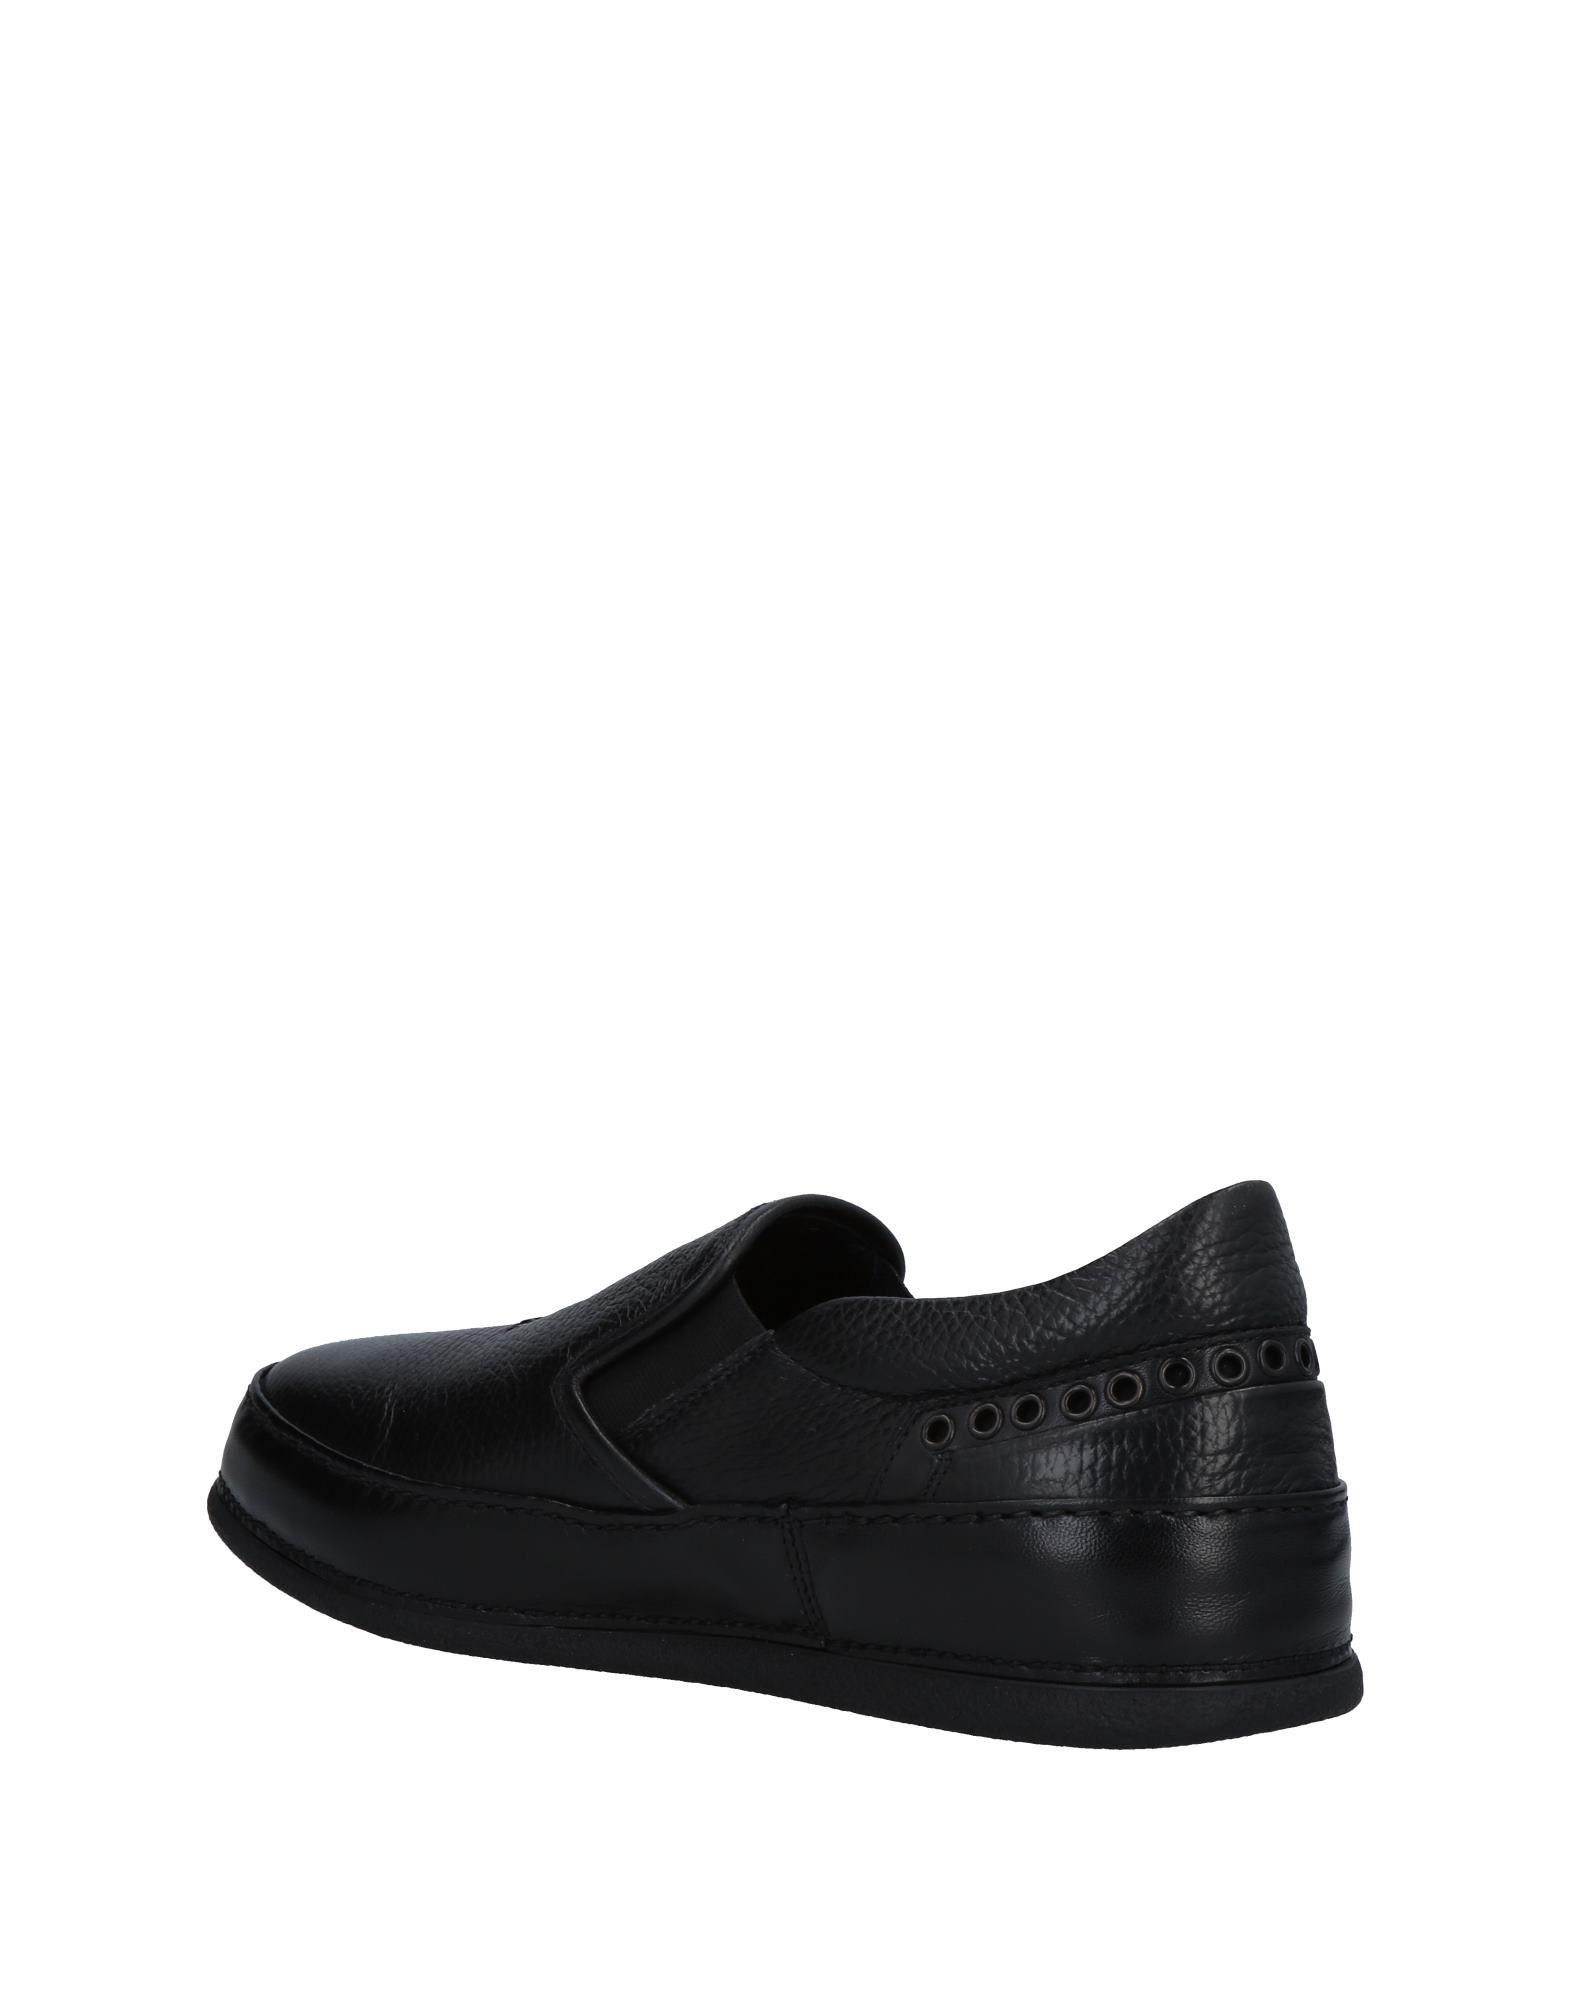 Bruno Bordese Sneakers - Men Bruno Bordese Sneakers Sneakers Sneakers online on  Canada - 11482433IB 7cf5c9